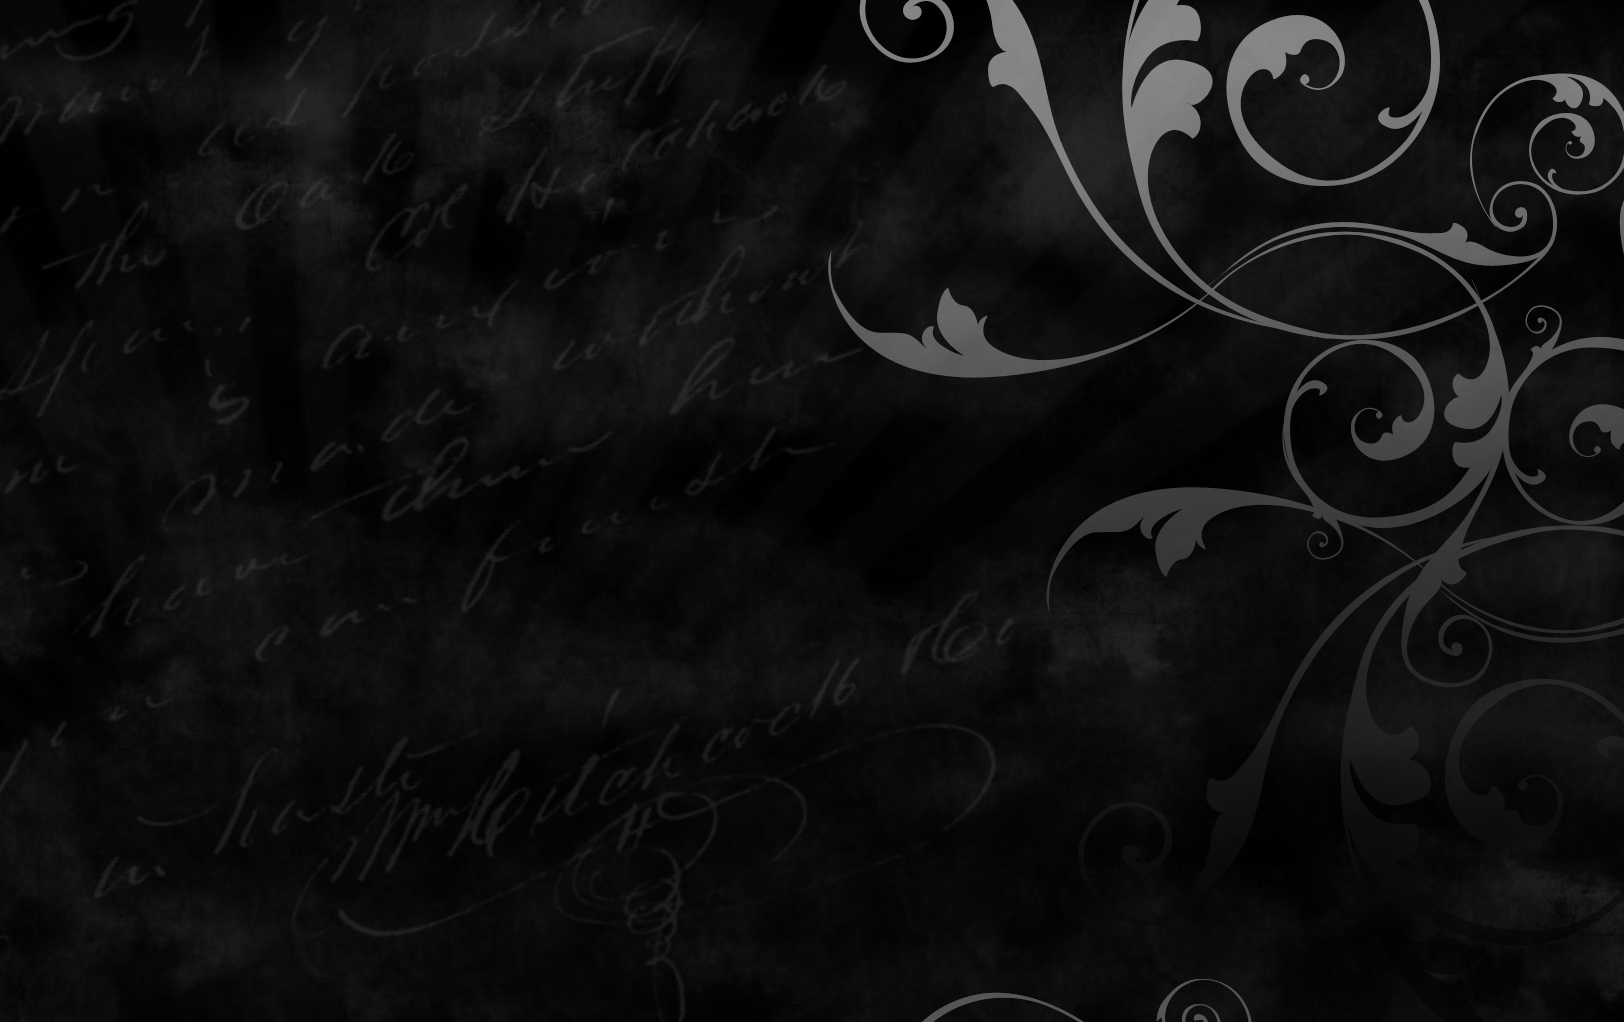 1080p iphone black wallpaper hd 54_